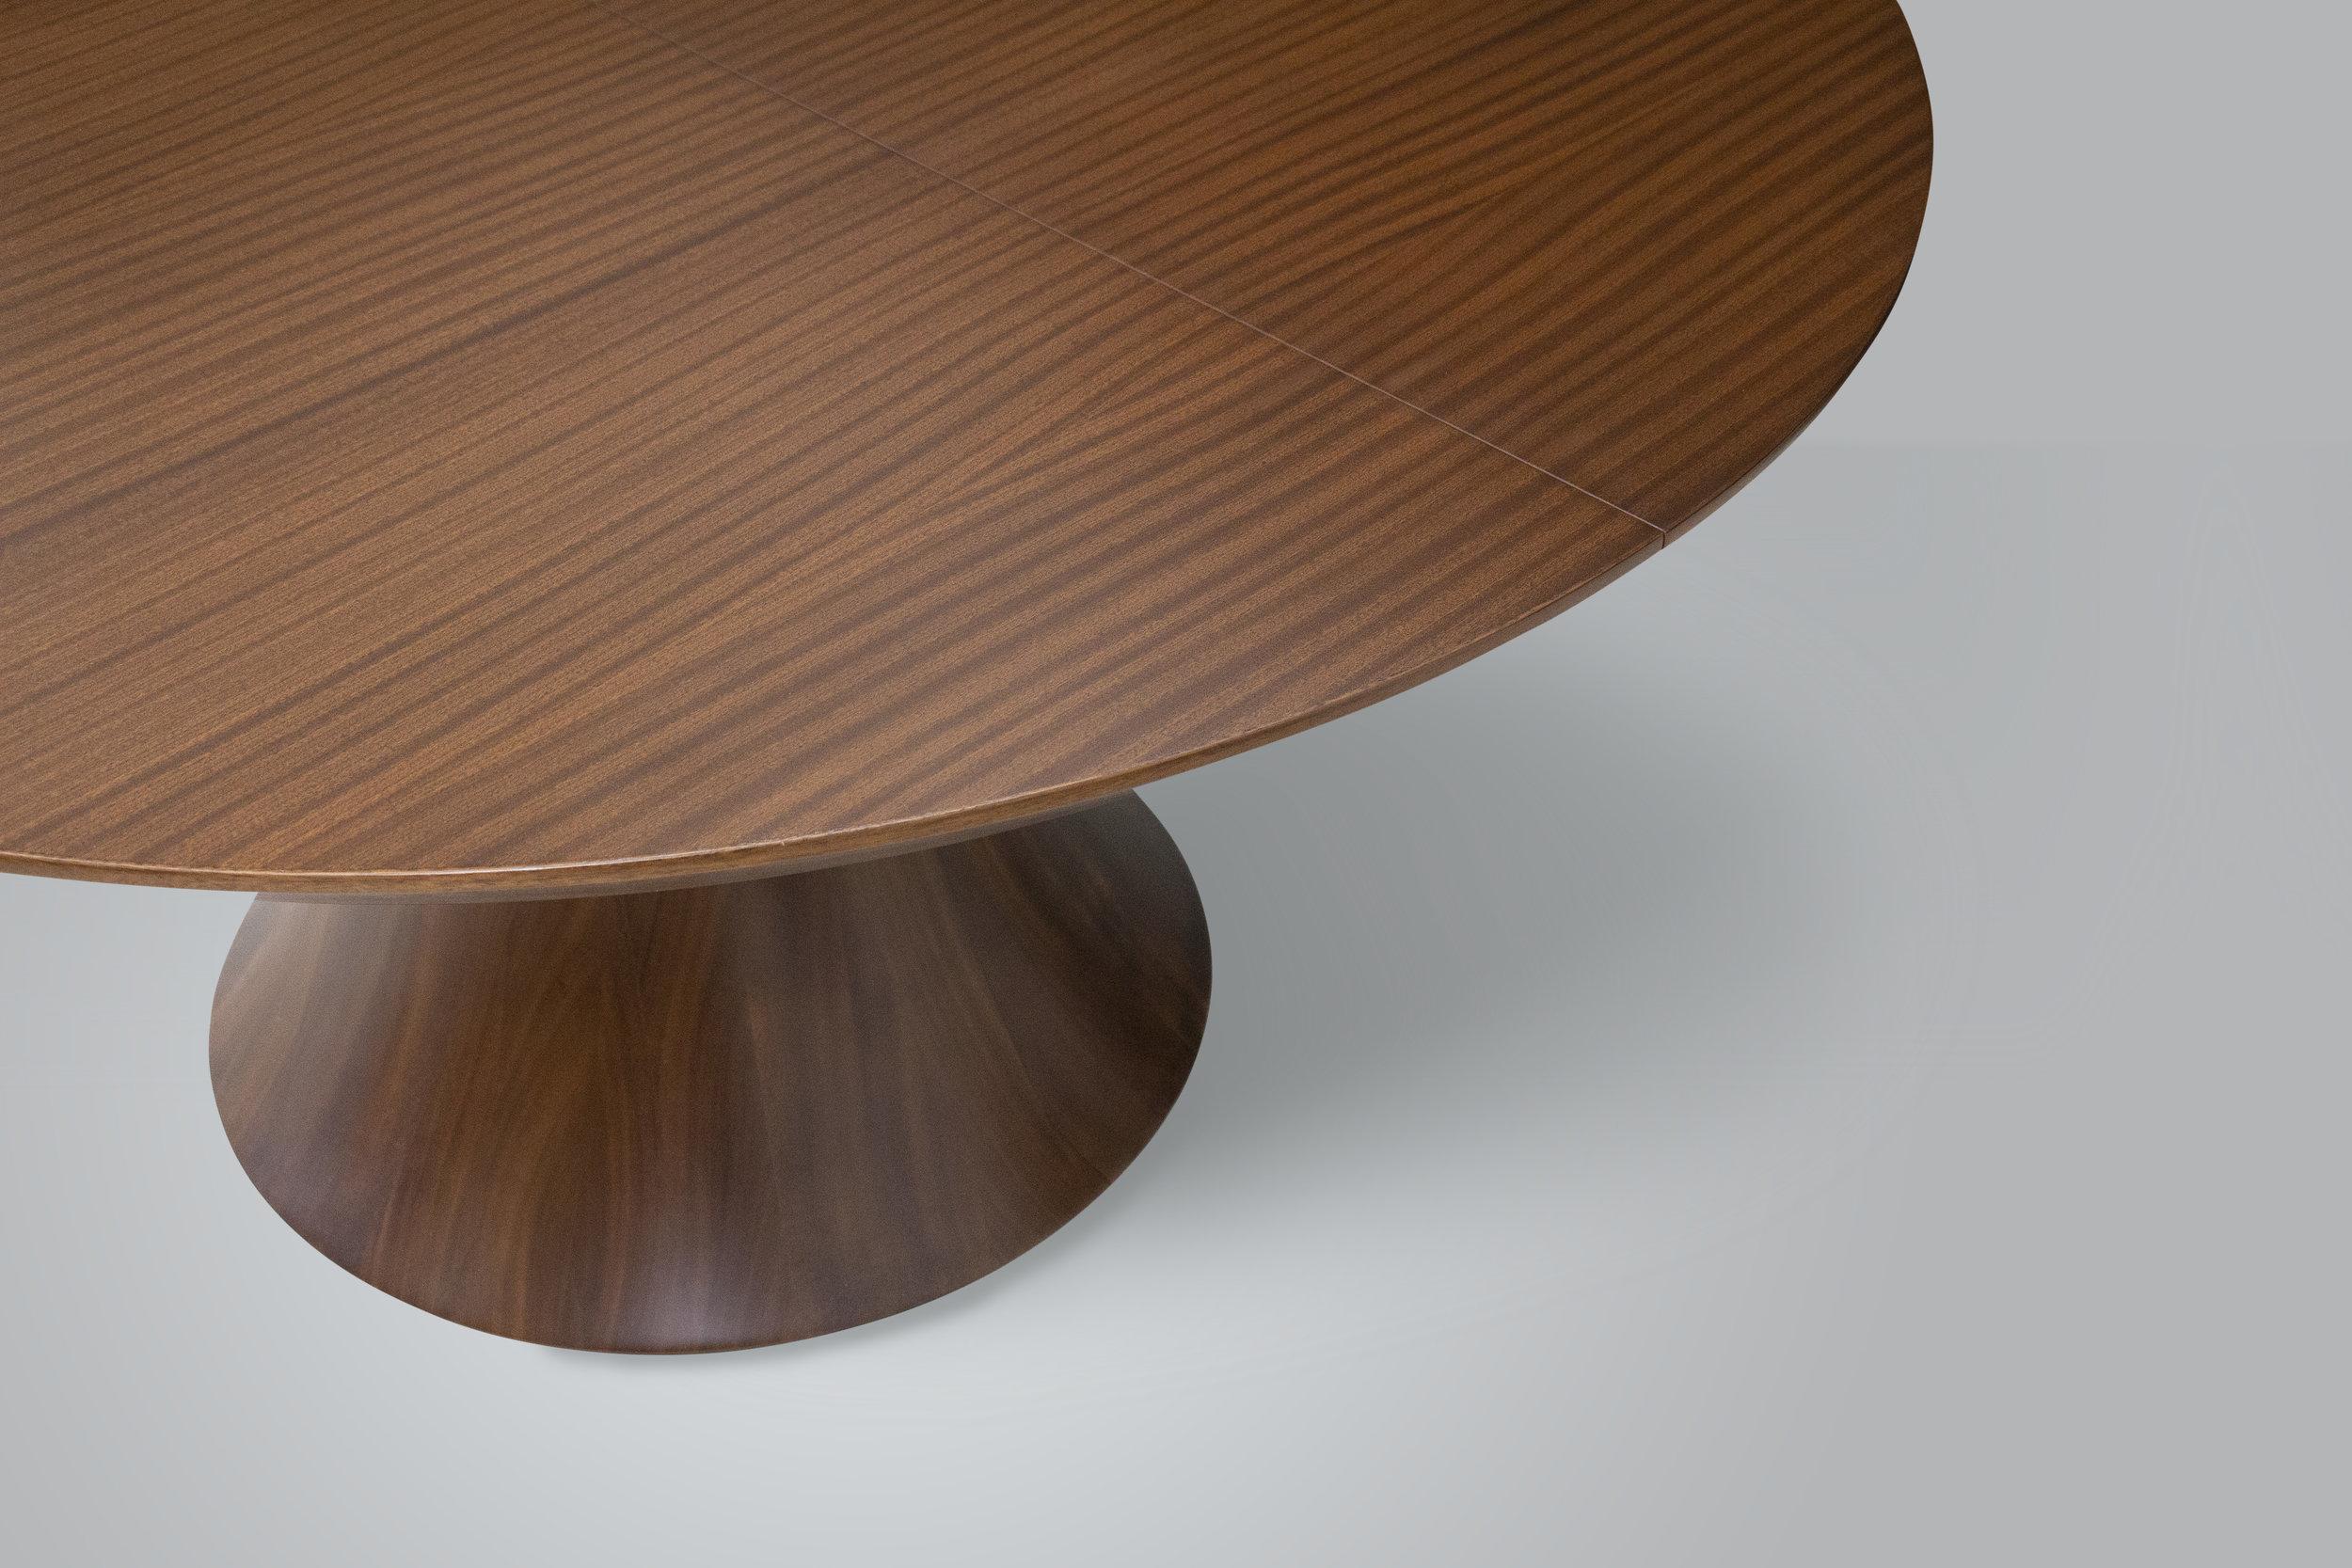 Pedestal Table_4.jpg